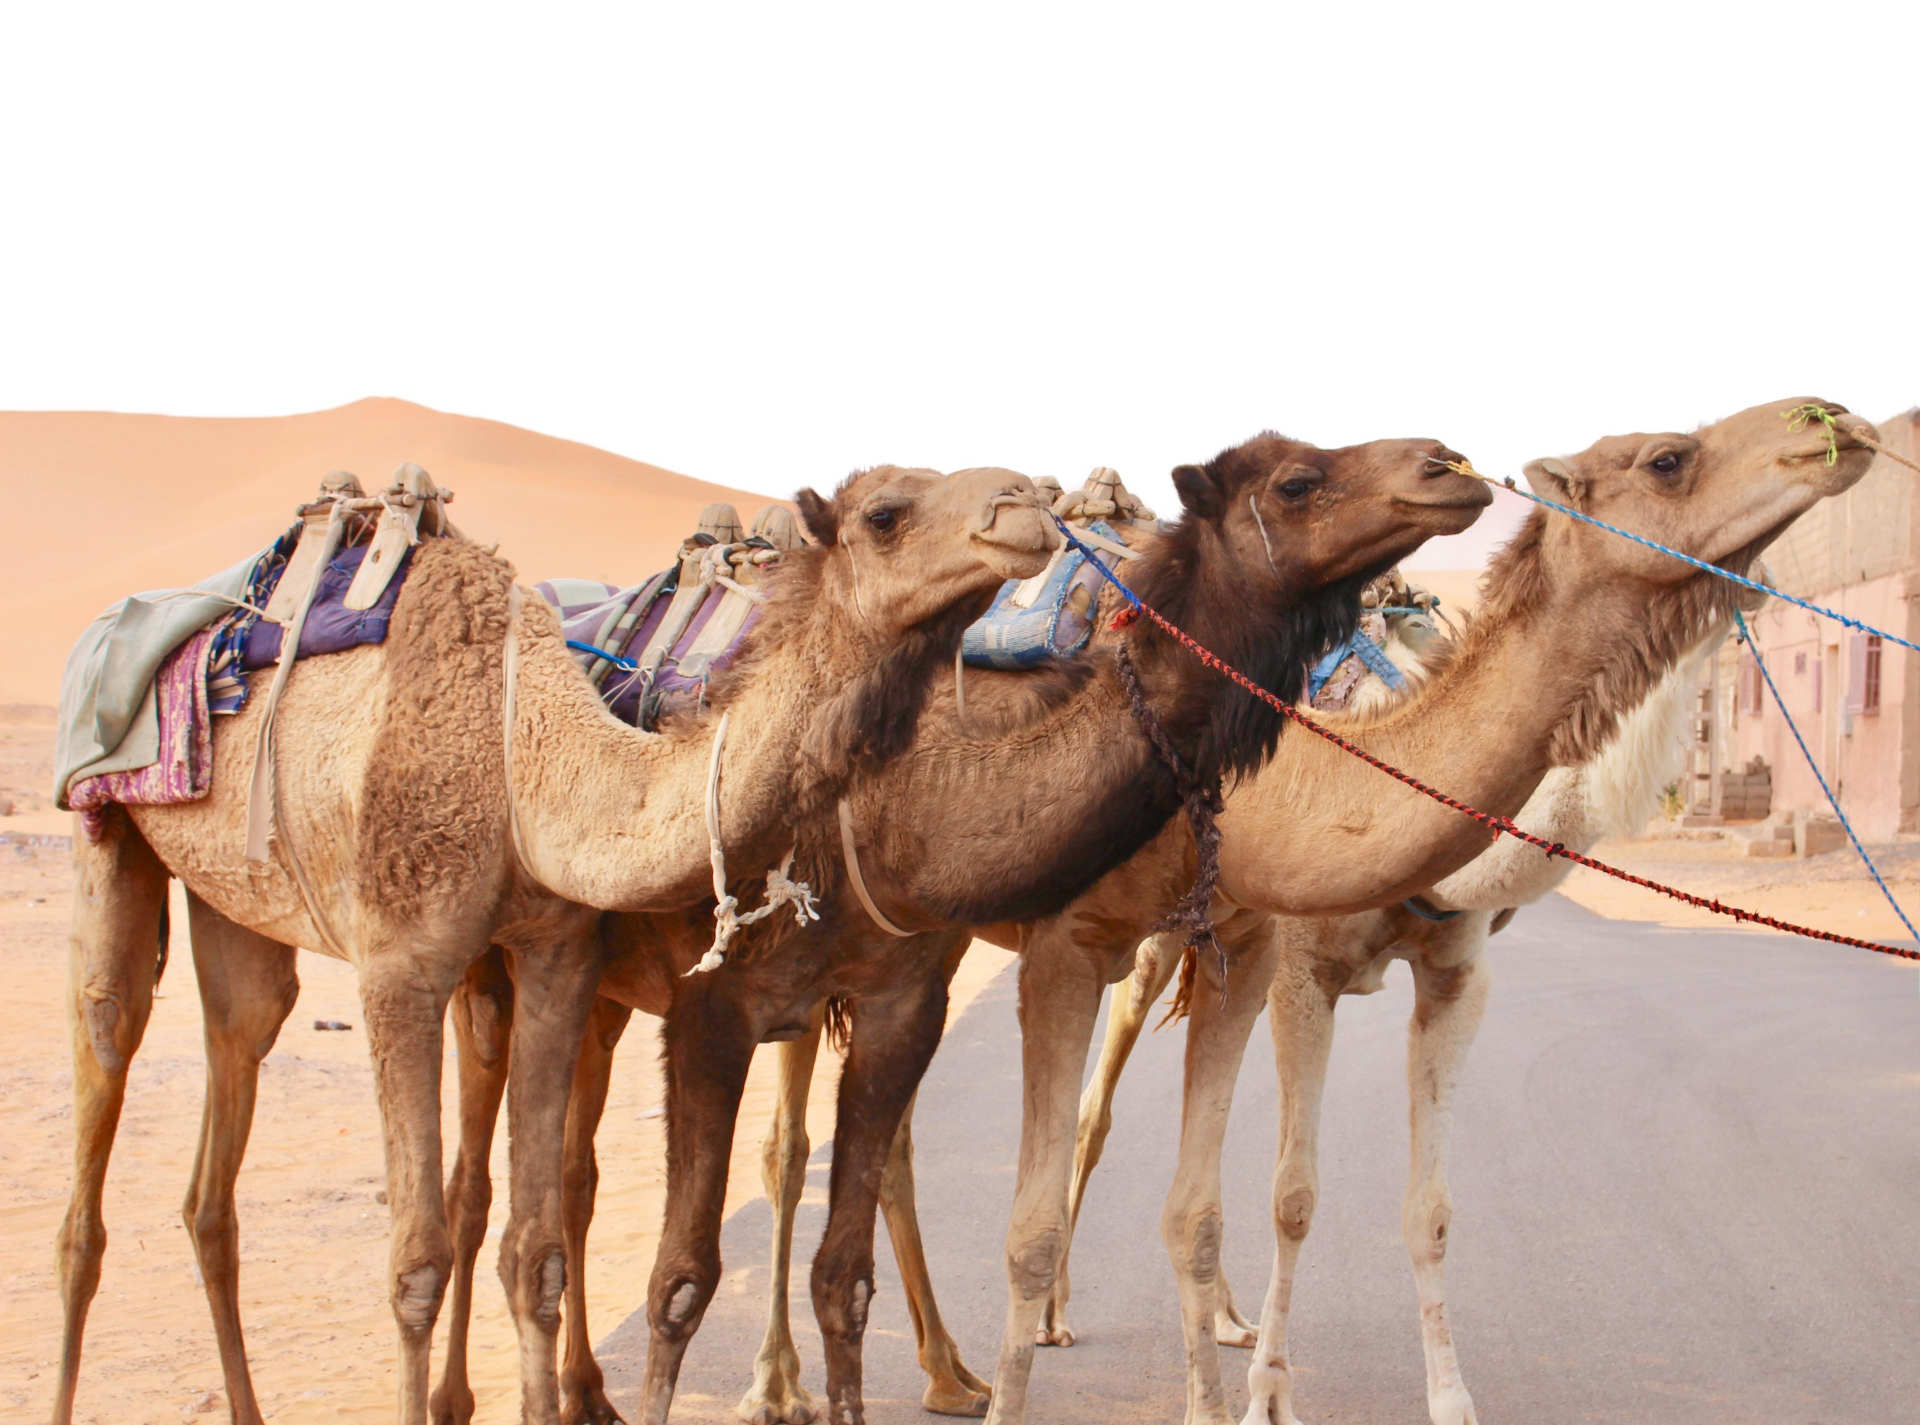 Custom-Travel-Planner-Network-Ethiopia-Four-Camels